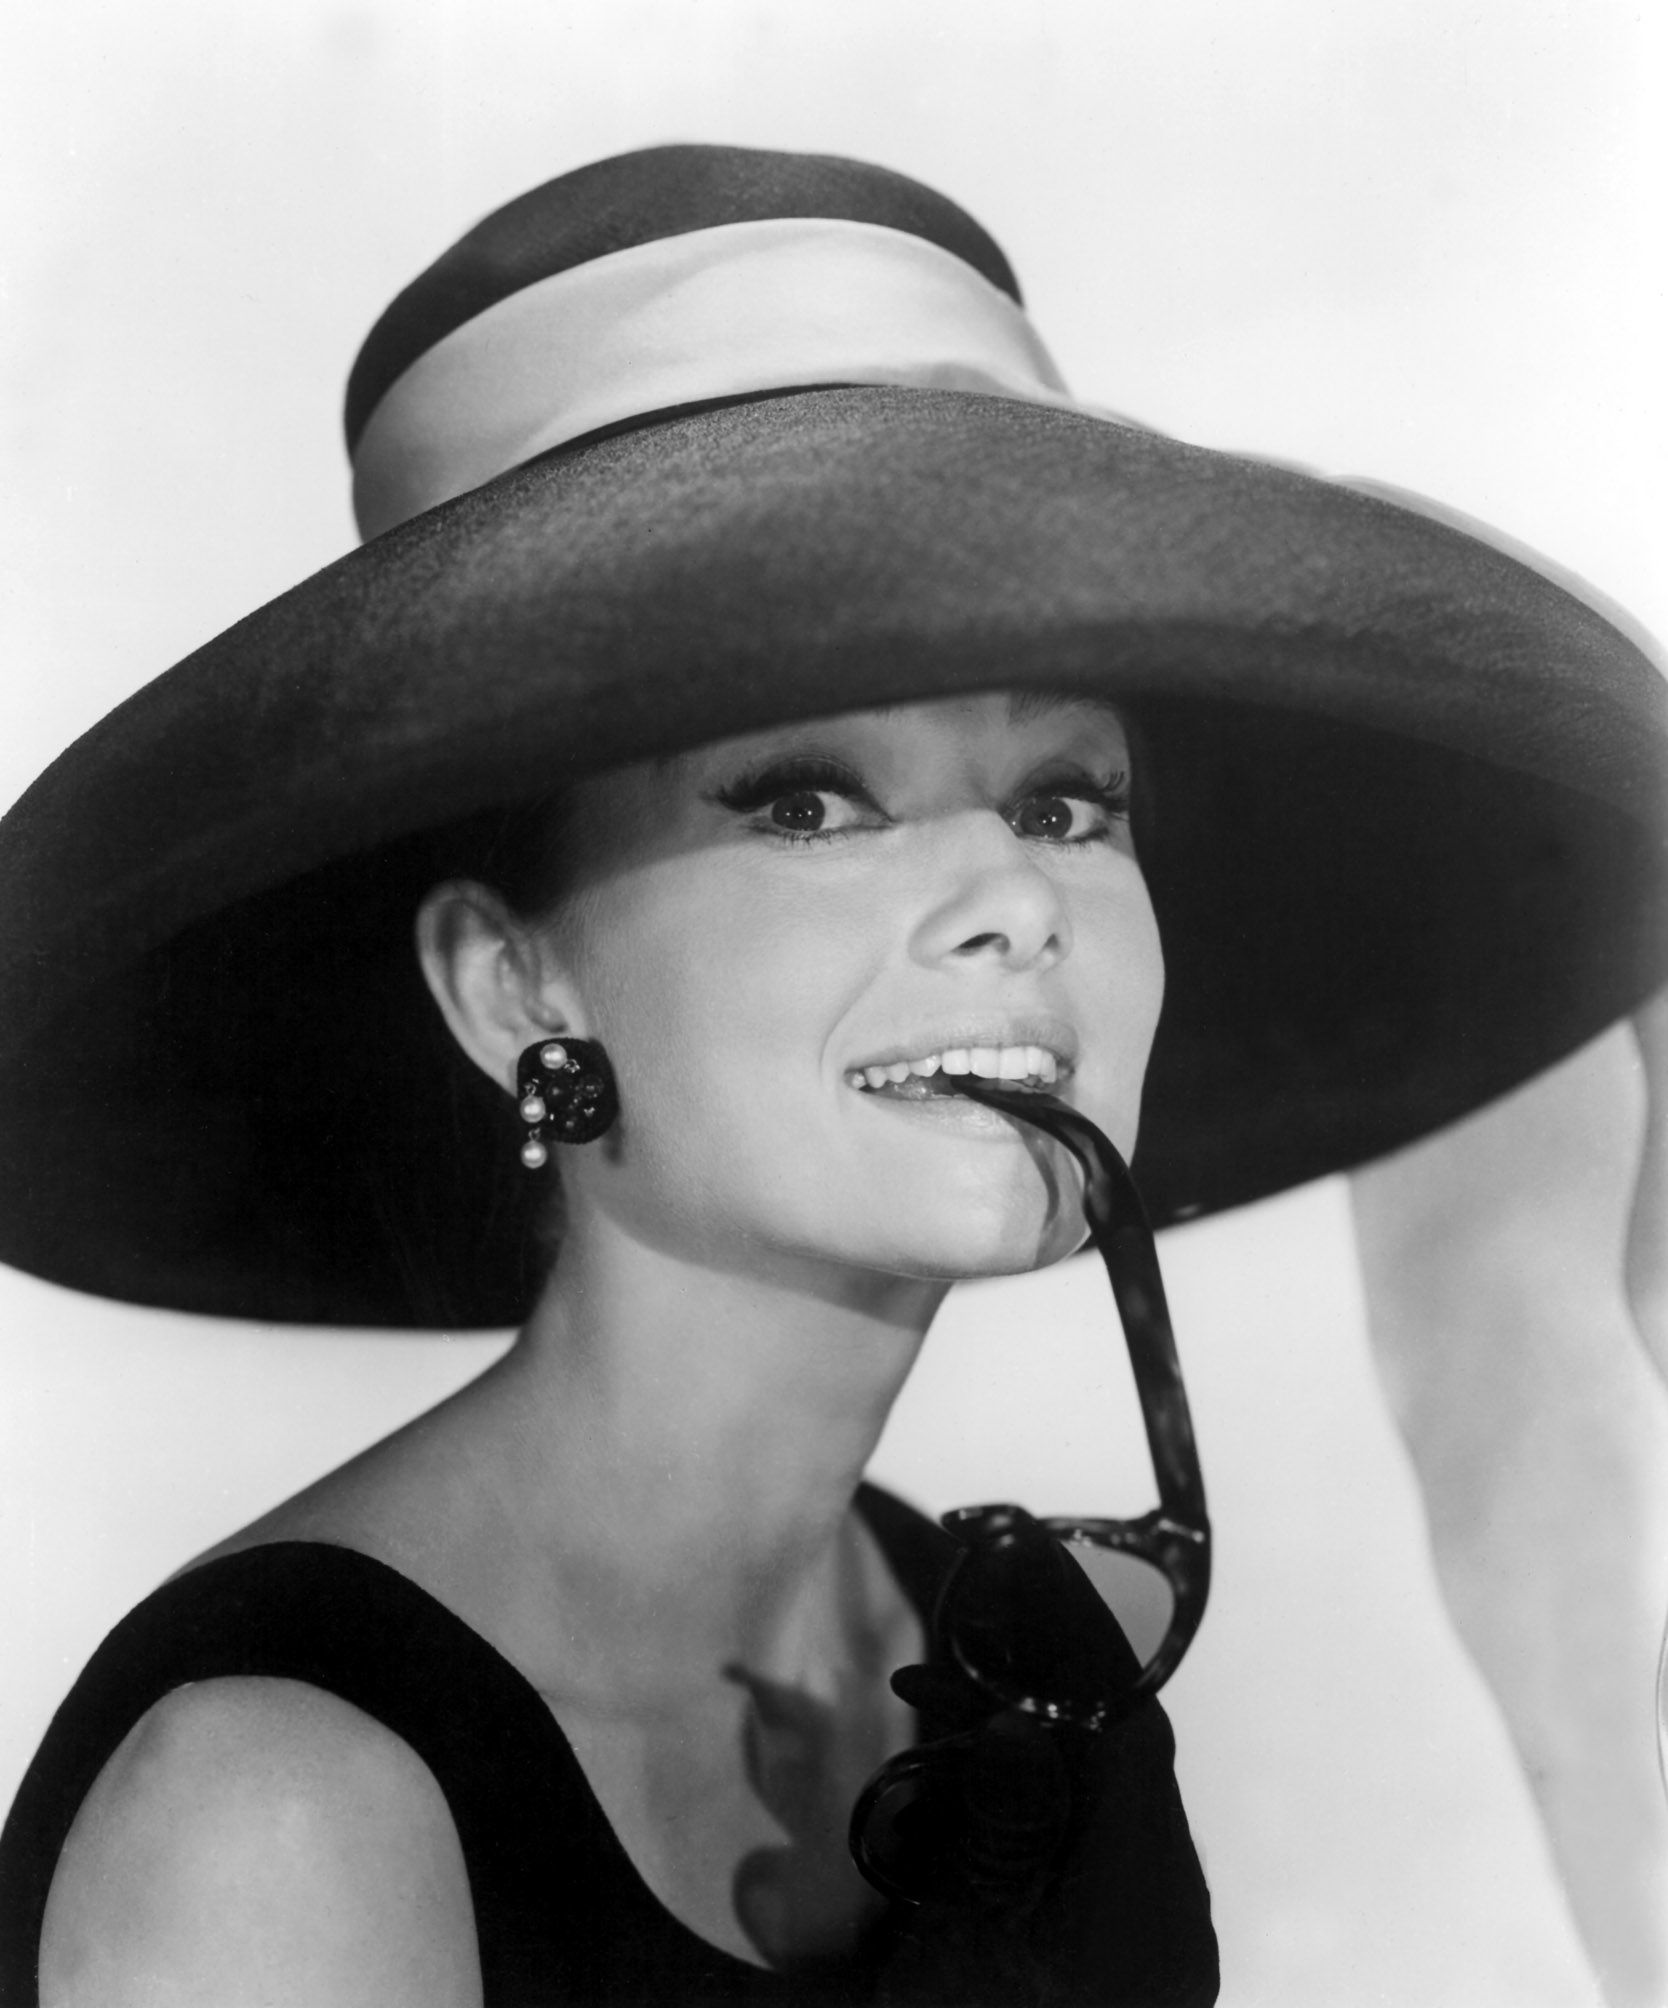 bdba08a018c Emilicia STYLE  Style Icons  Audrey Hepburn